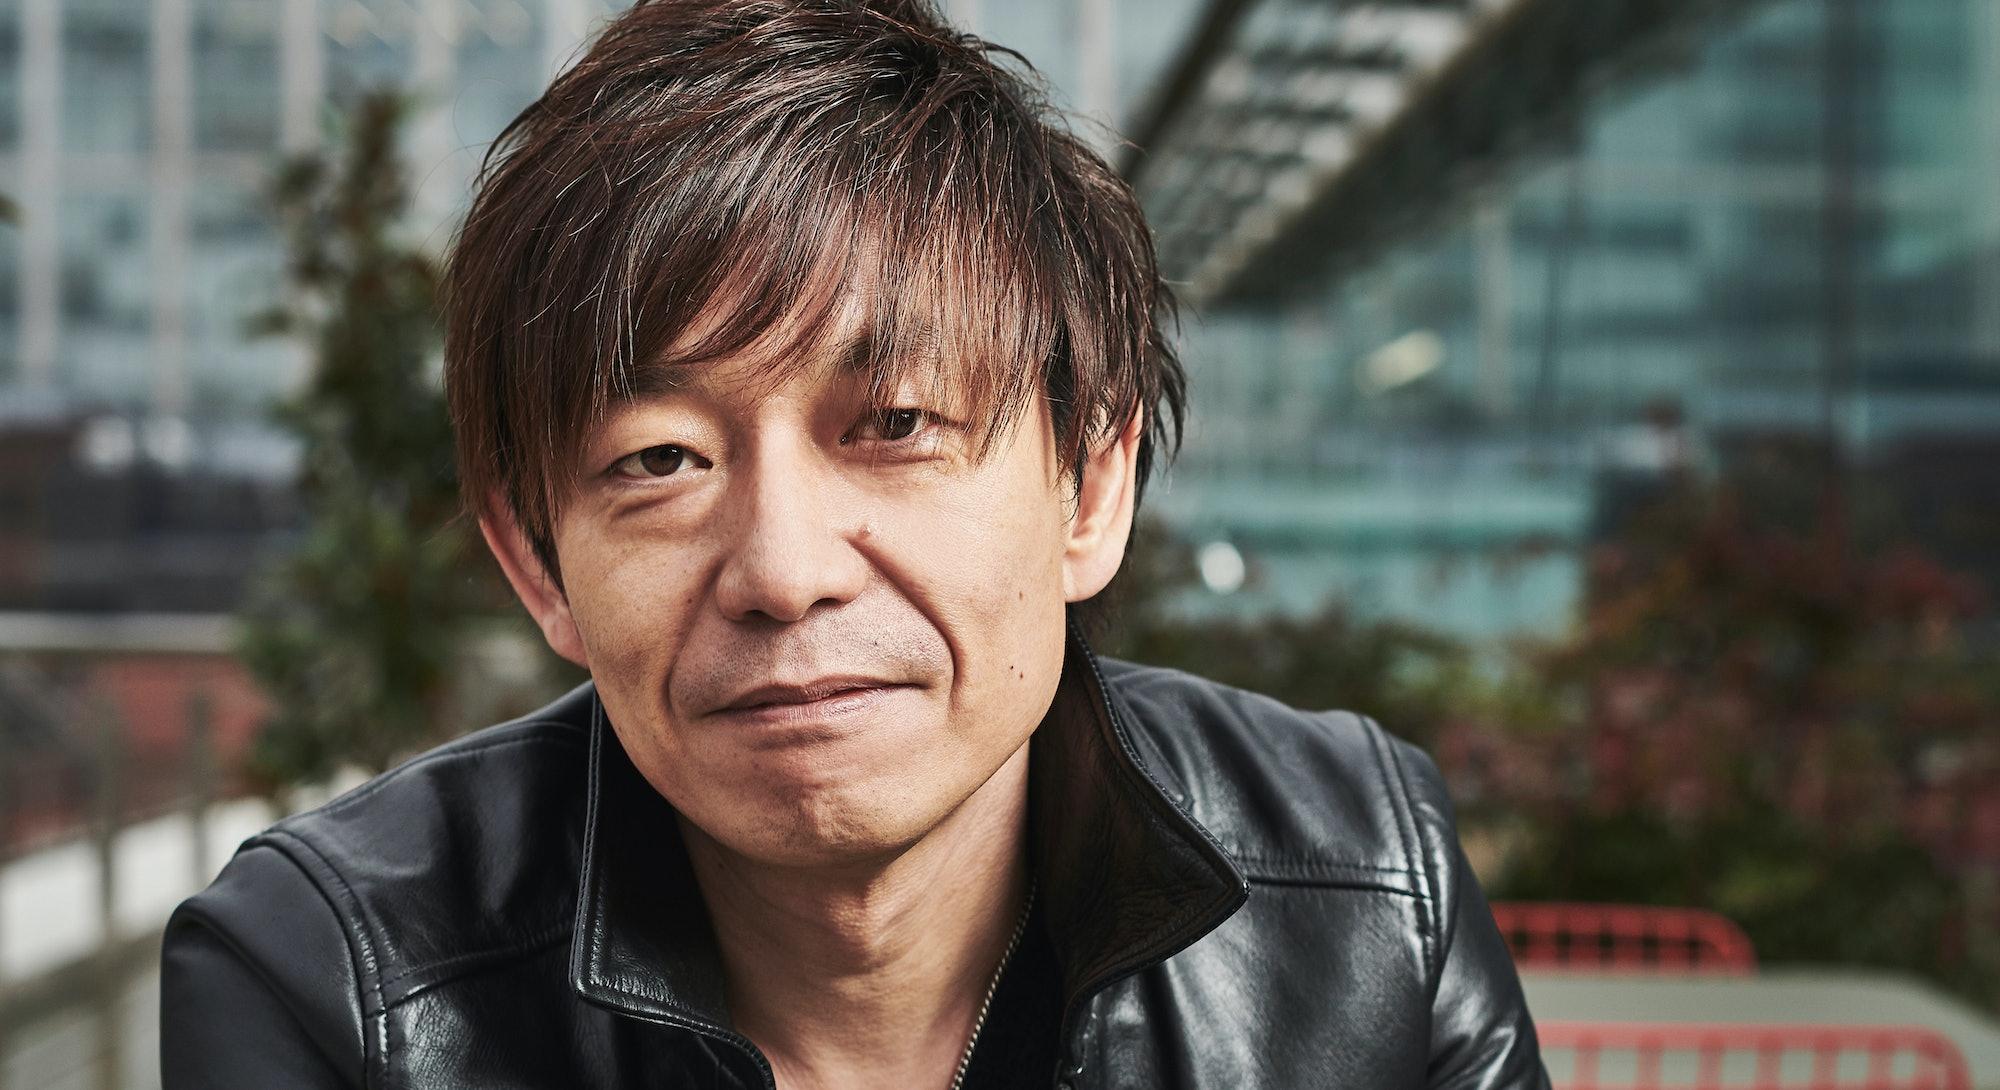 LONDON, UNITED KINGDOM - NOVEMBER 21: Portrait of Japanese video games developer Naoki Yoshida, phot...